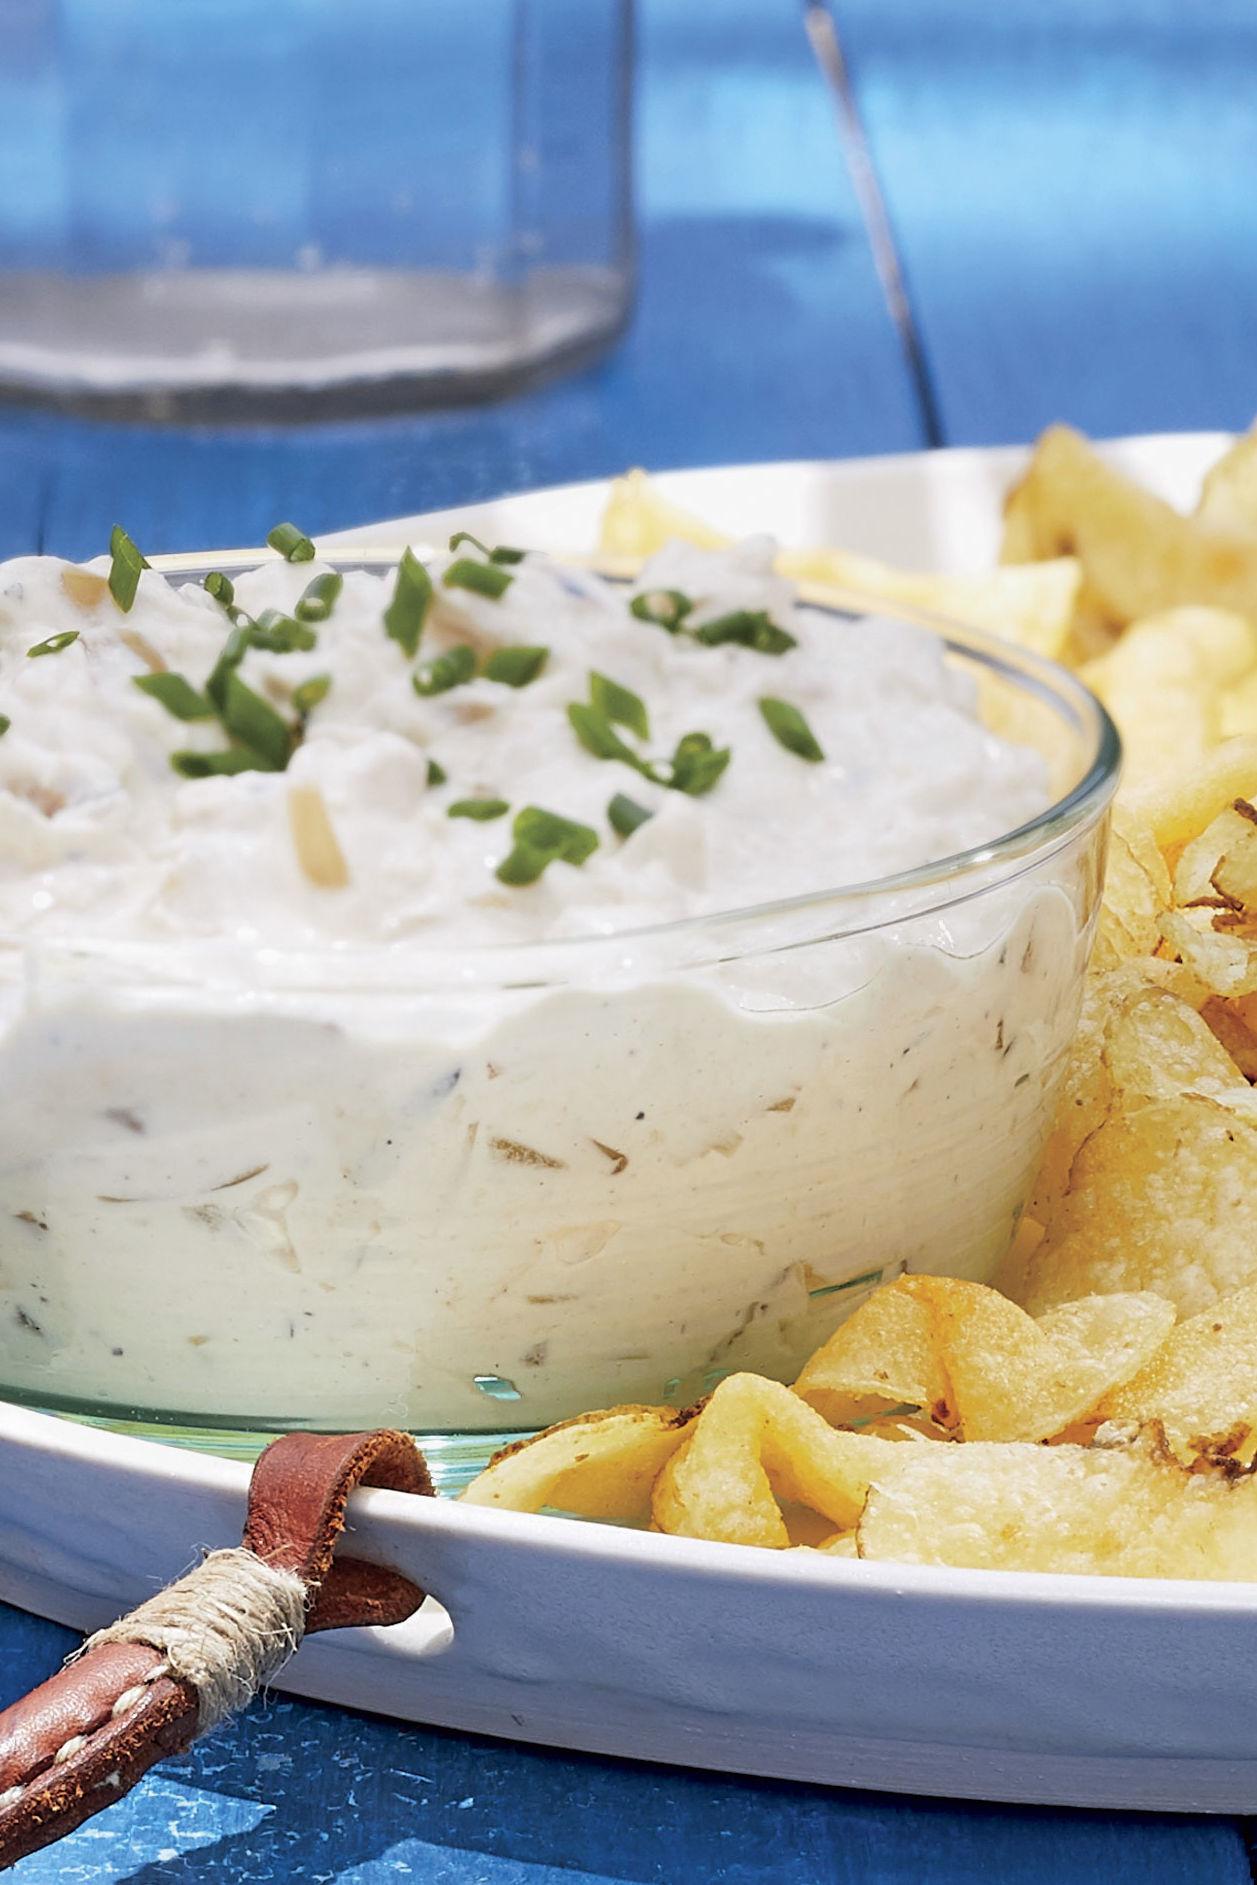 Homemade Onion Dip